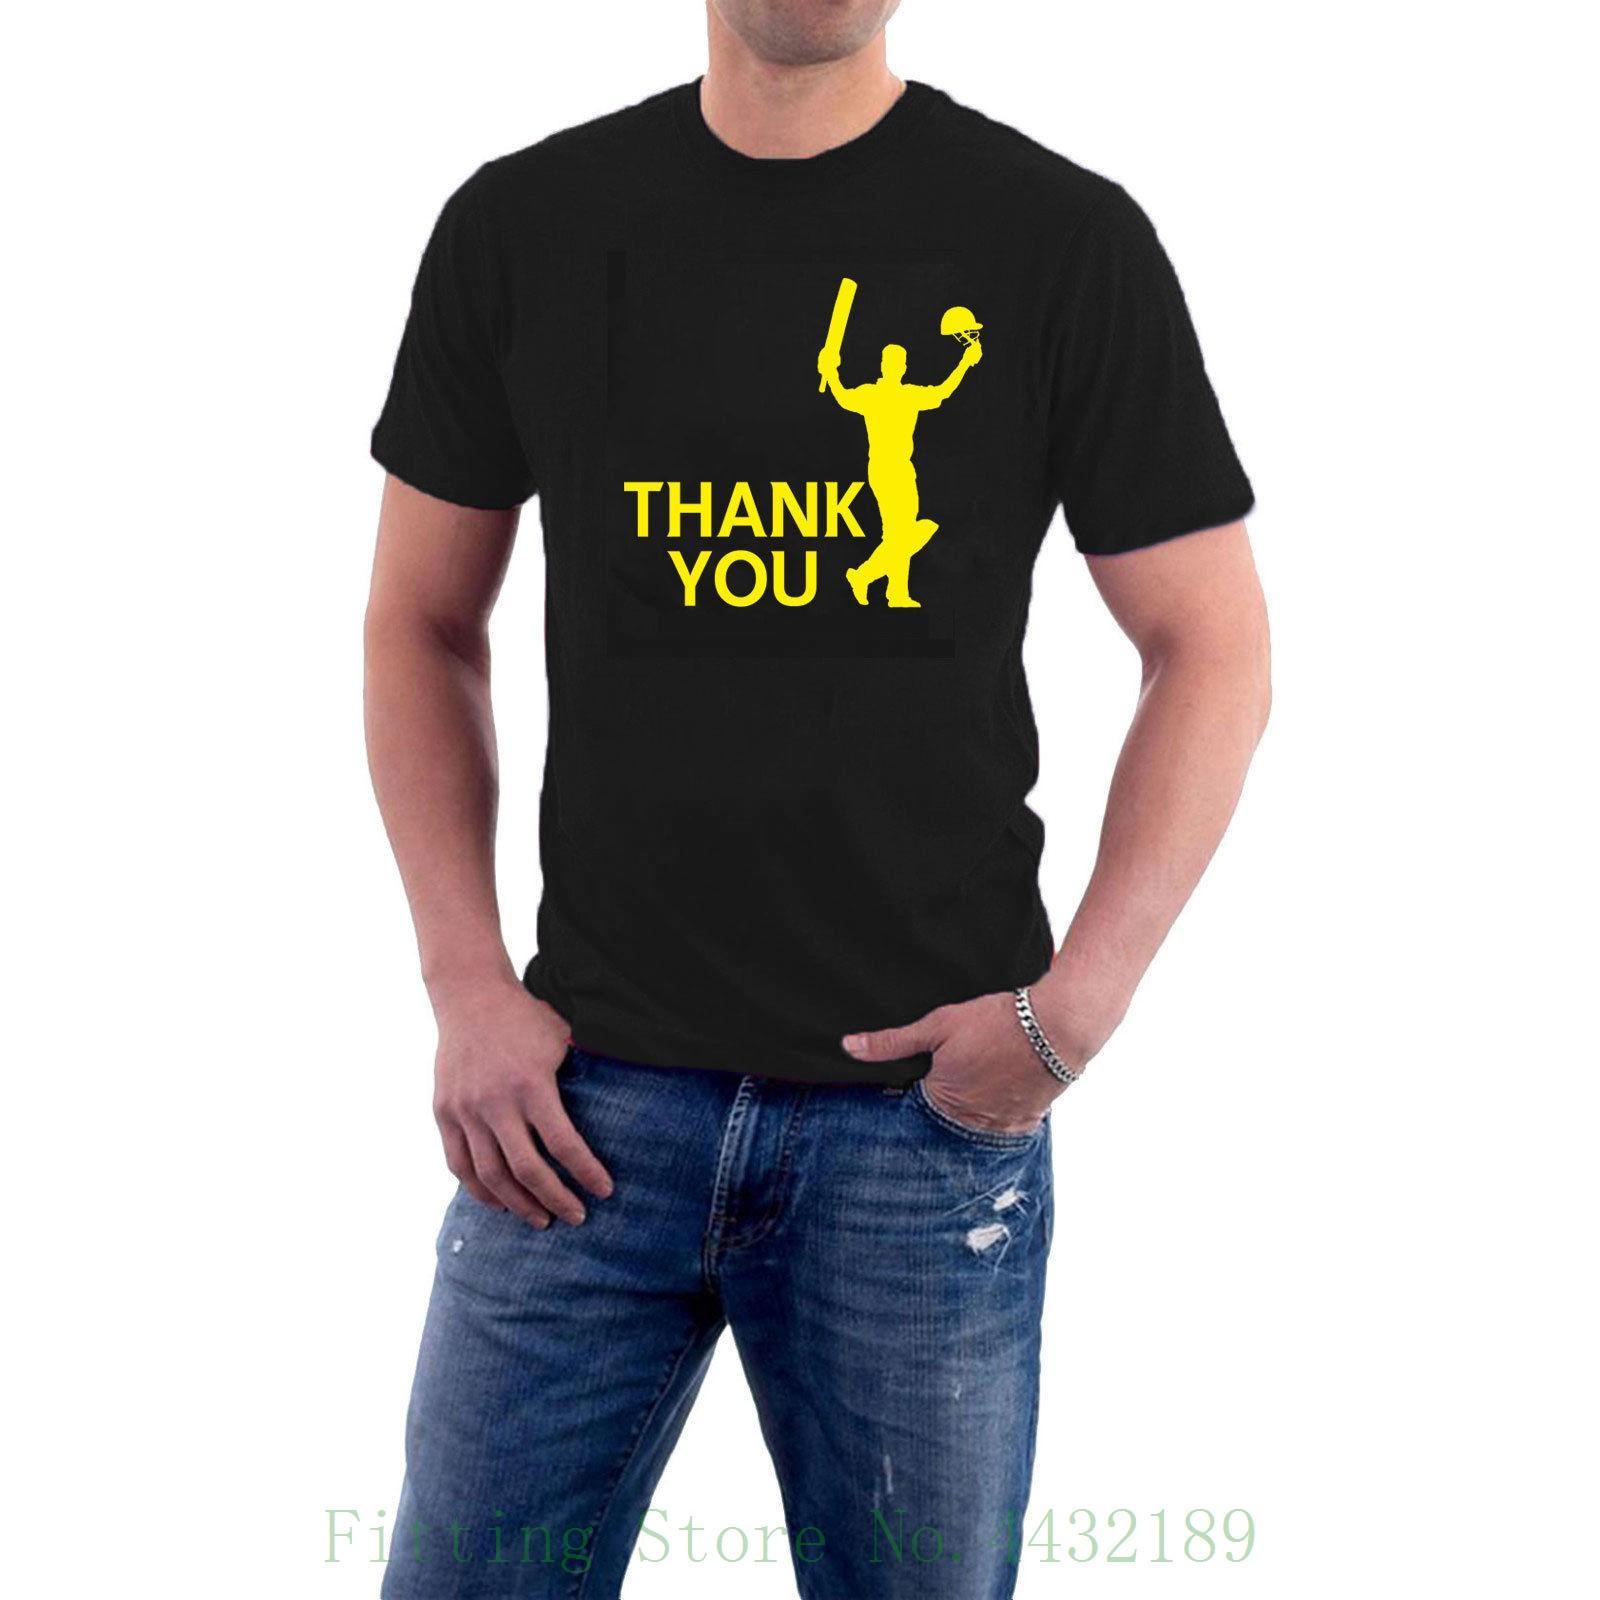 Company Tee Shirt Design Ideas – EDGE Engineering and ...